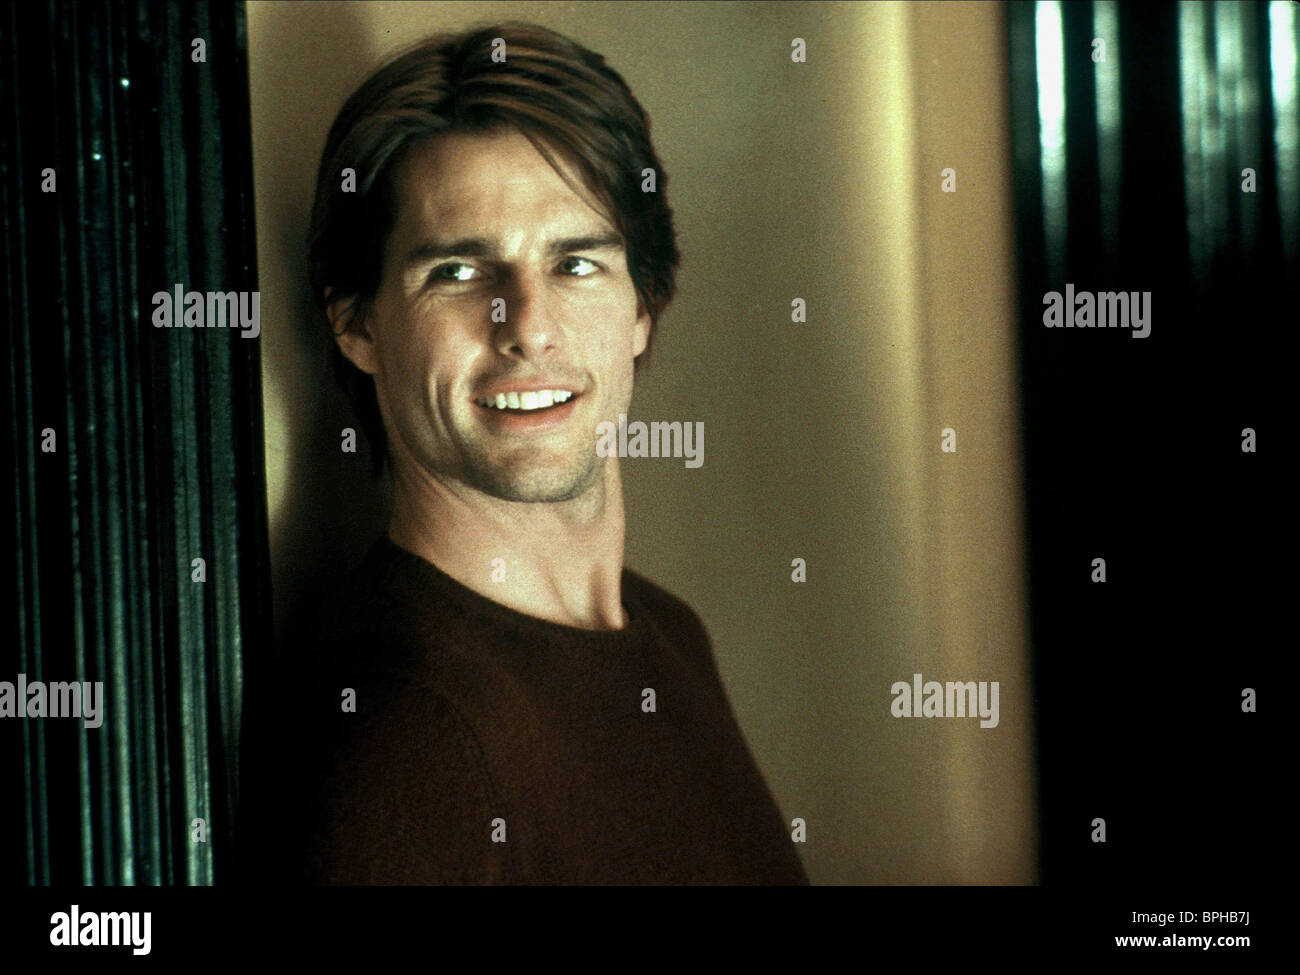 Tom Cruise Vanilla Sky 2001 Stock Photo Alamy